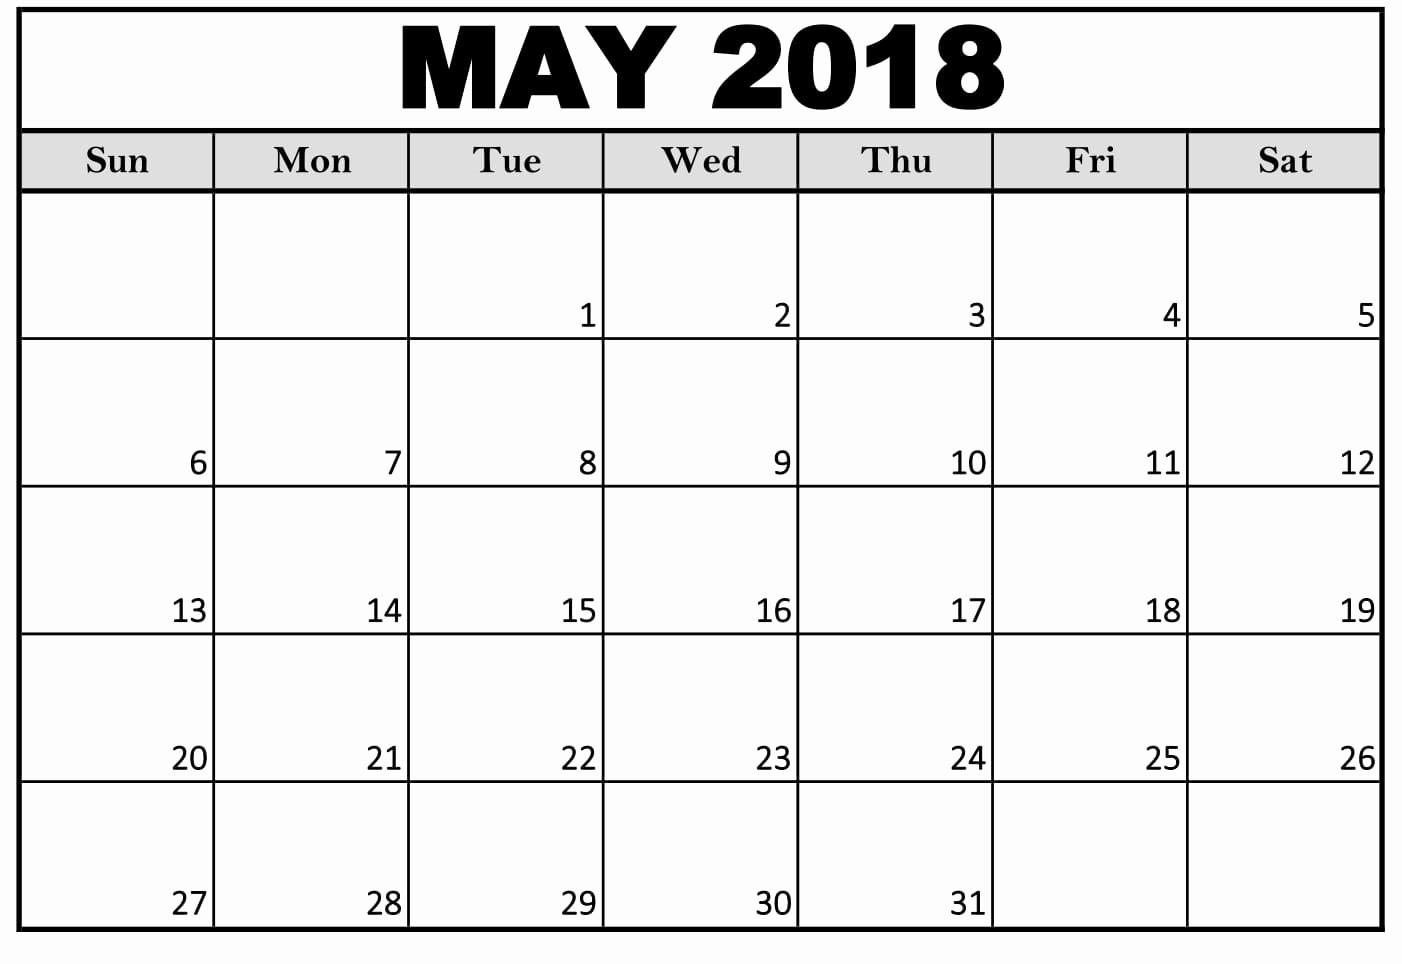 Blank May 2018 Calendar Printable Awesome Blank May 2018 Calendar Printable Free Download